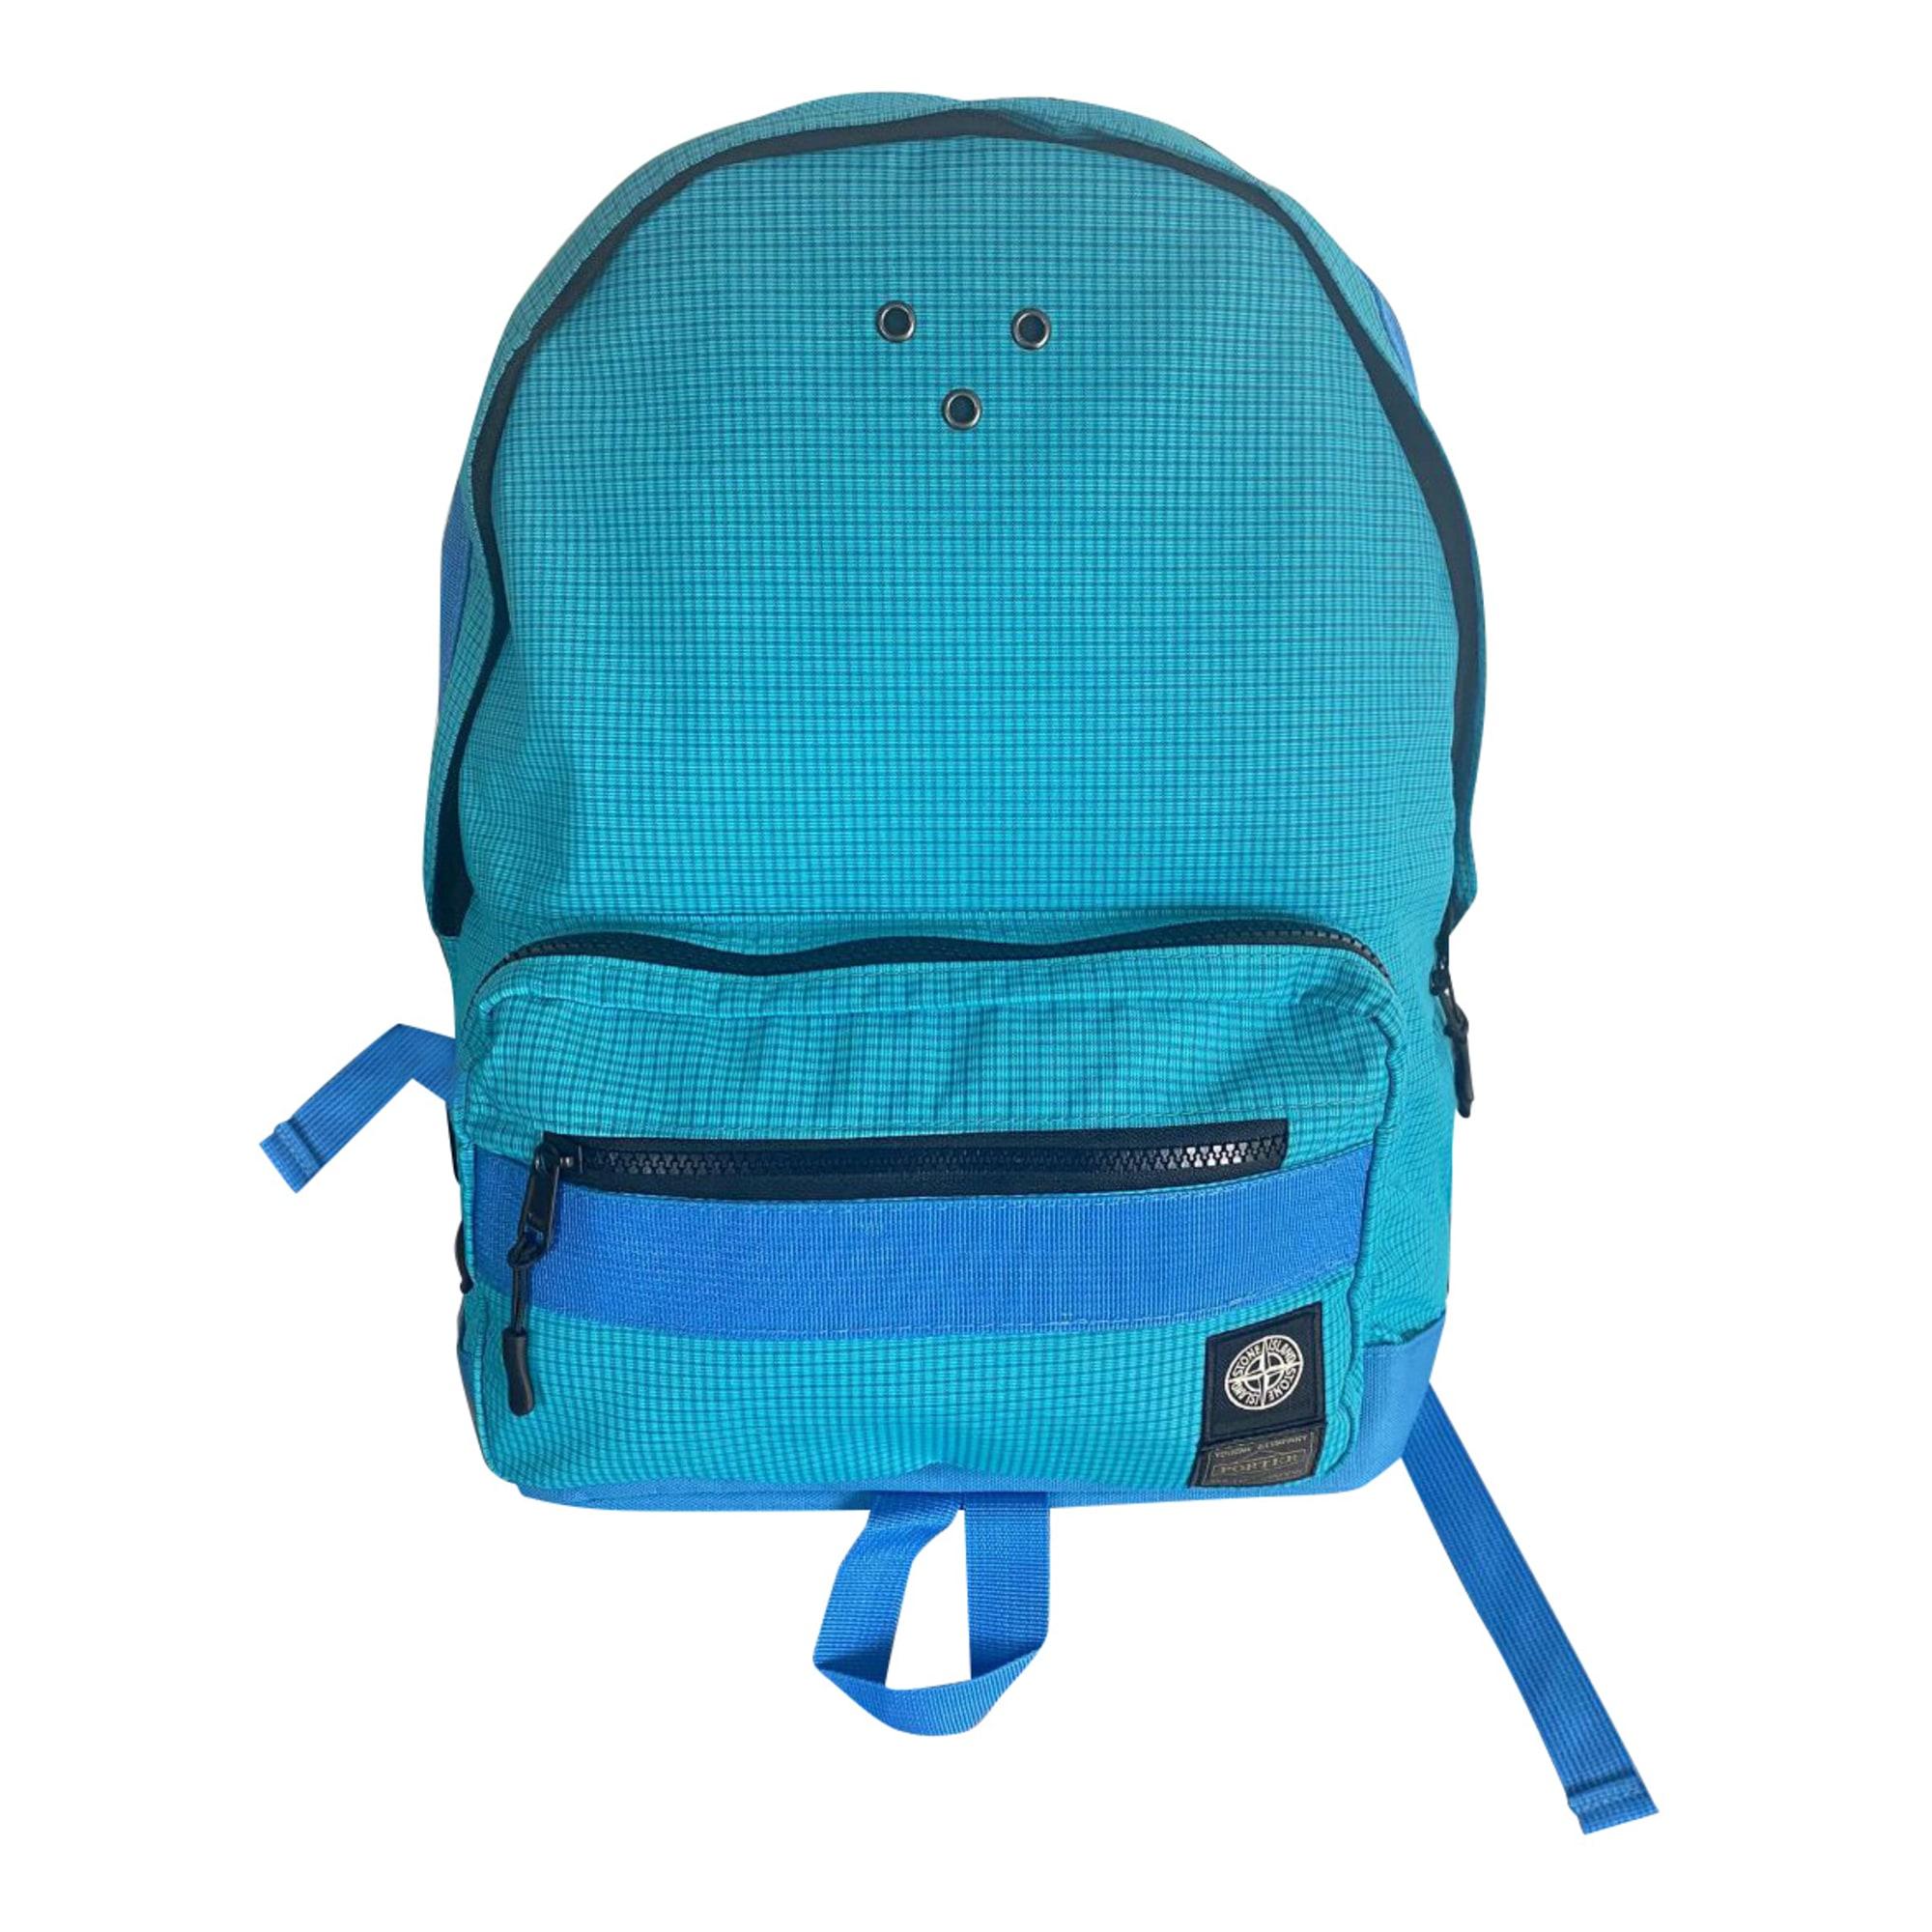 Backpack STONE ISLAND Blue, navy, turquoise